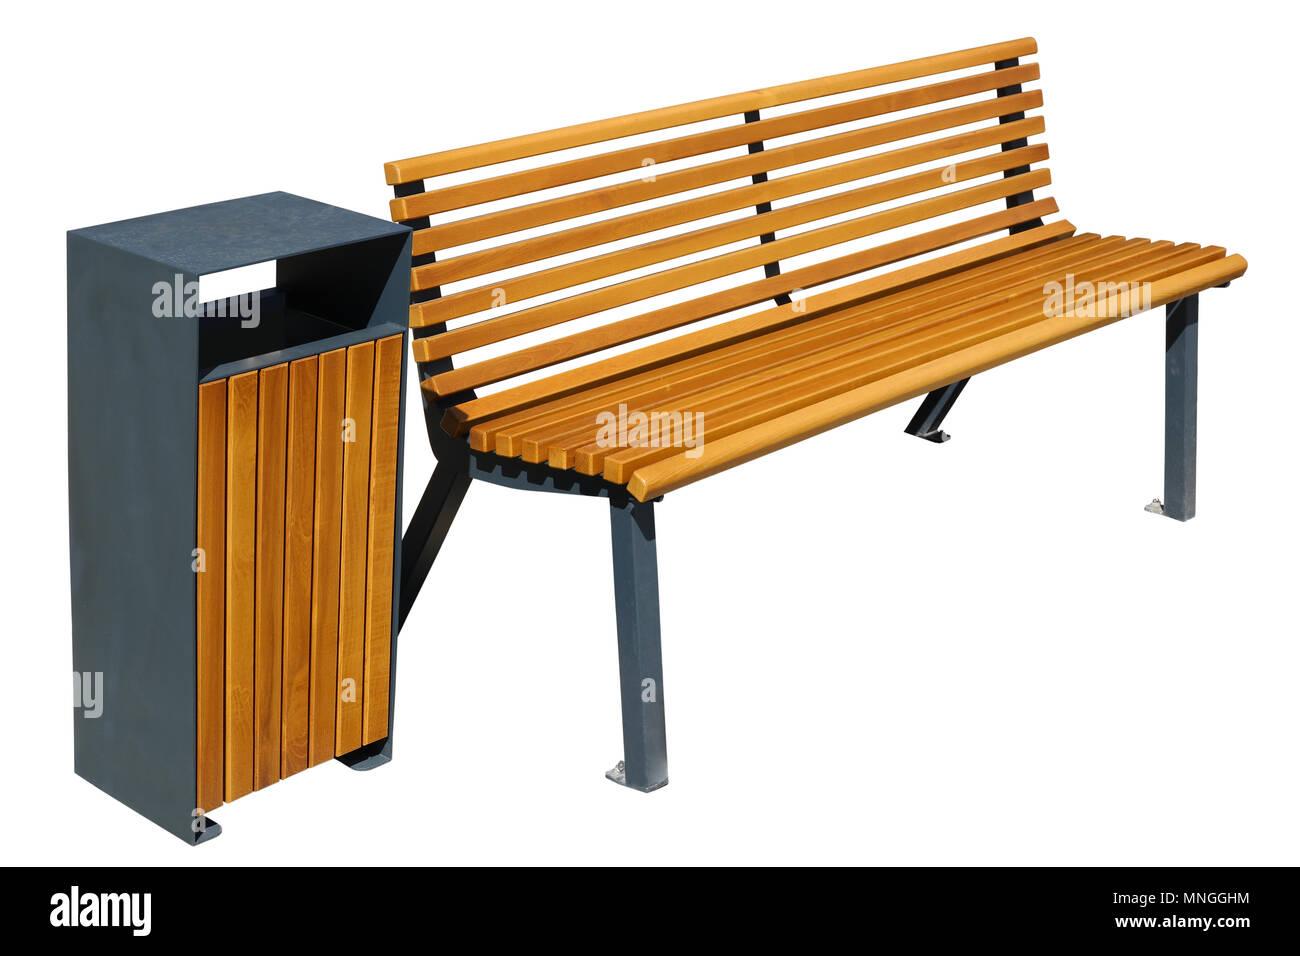 Awe Inspiring Wooden New Yellow Garden Bench With Metal Legs And Modrn Uwap Interior Chair Design Uwaporg